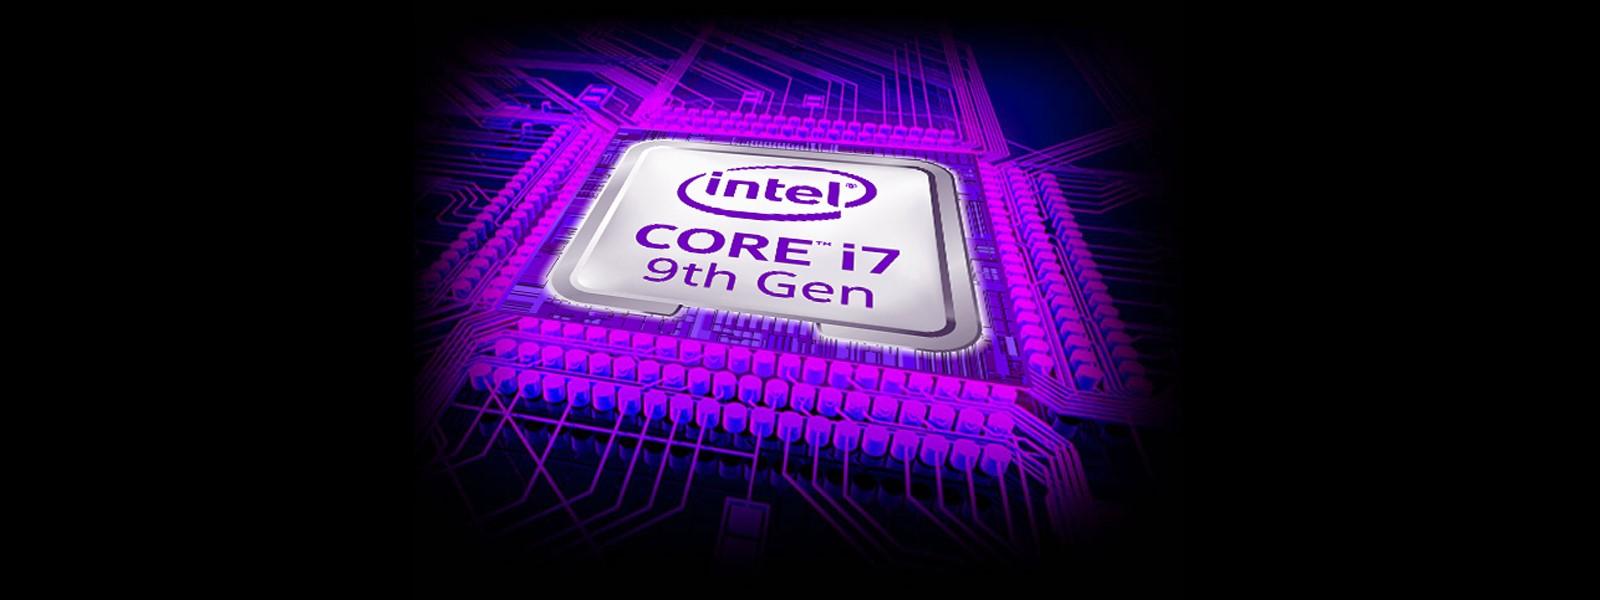 CLEVO P970RF Intel Core i7-9750H | Metal Chassis | NVIDIA